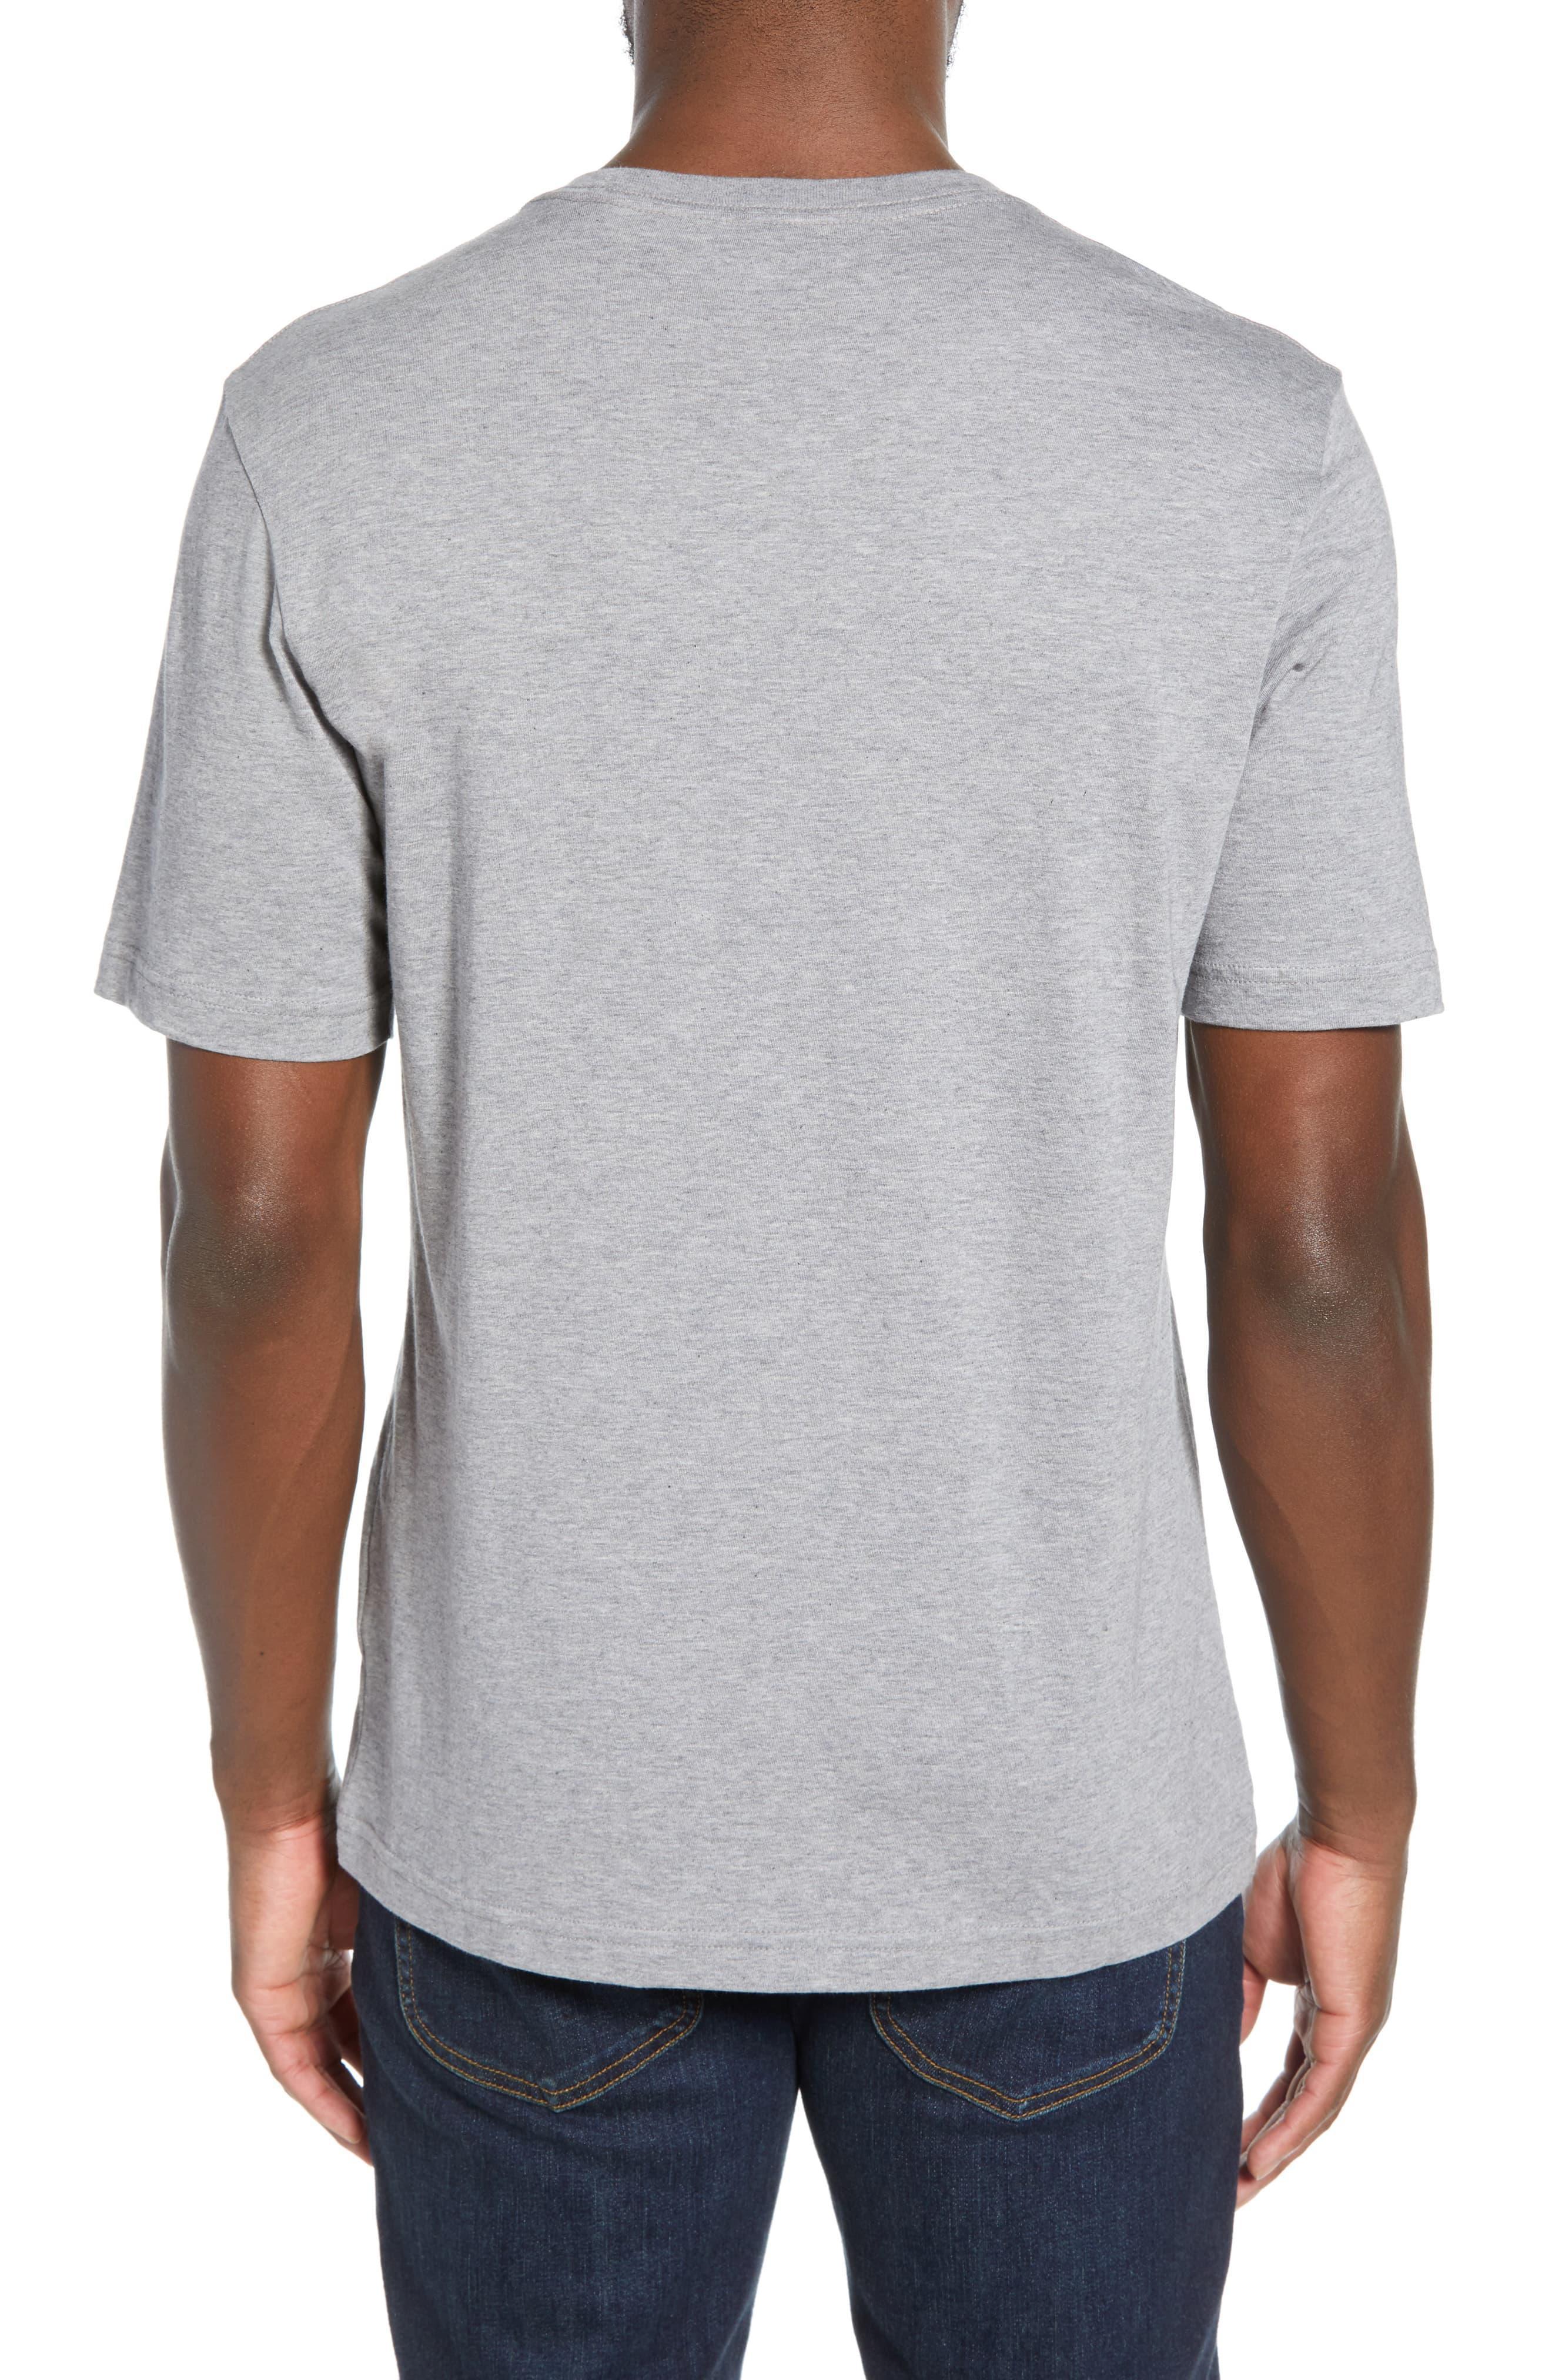 beaffc0f Travis Mathew Dad Bod Regular Fit T-shirt in Blue for Men - Lyst